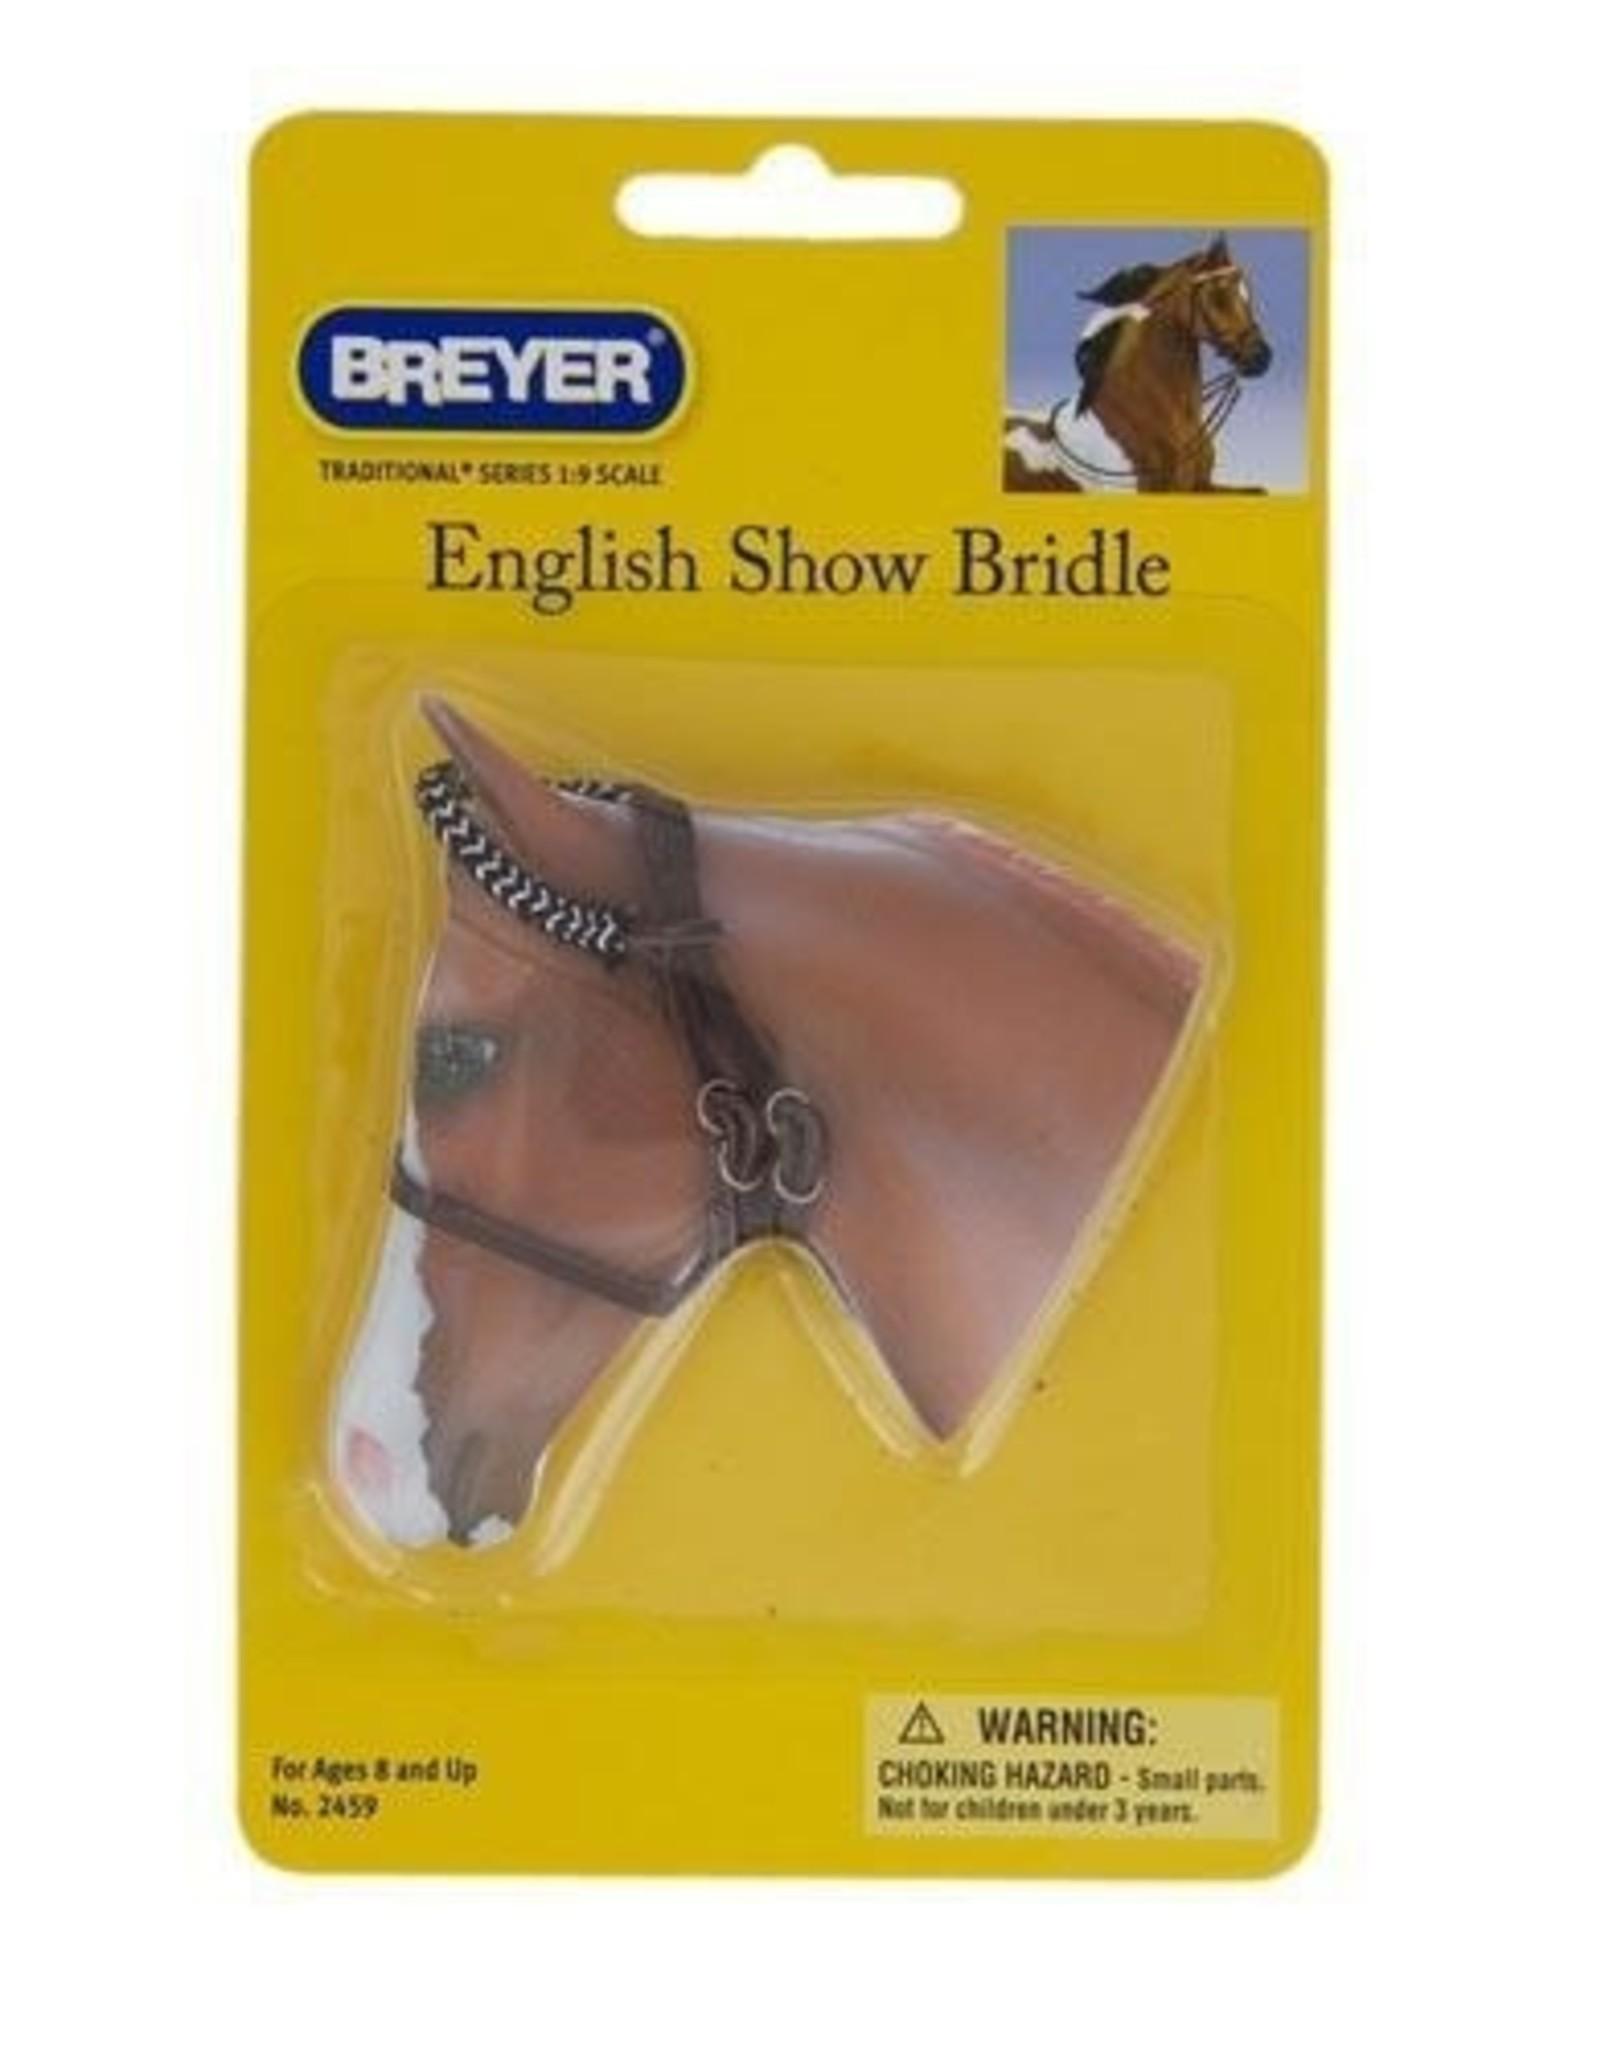 Breyer English Show Bridle